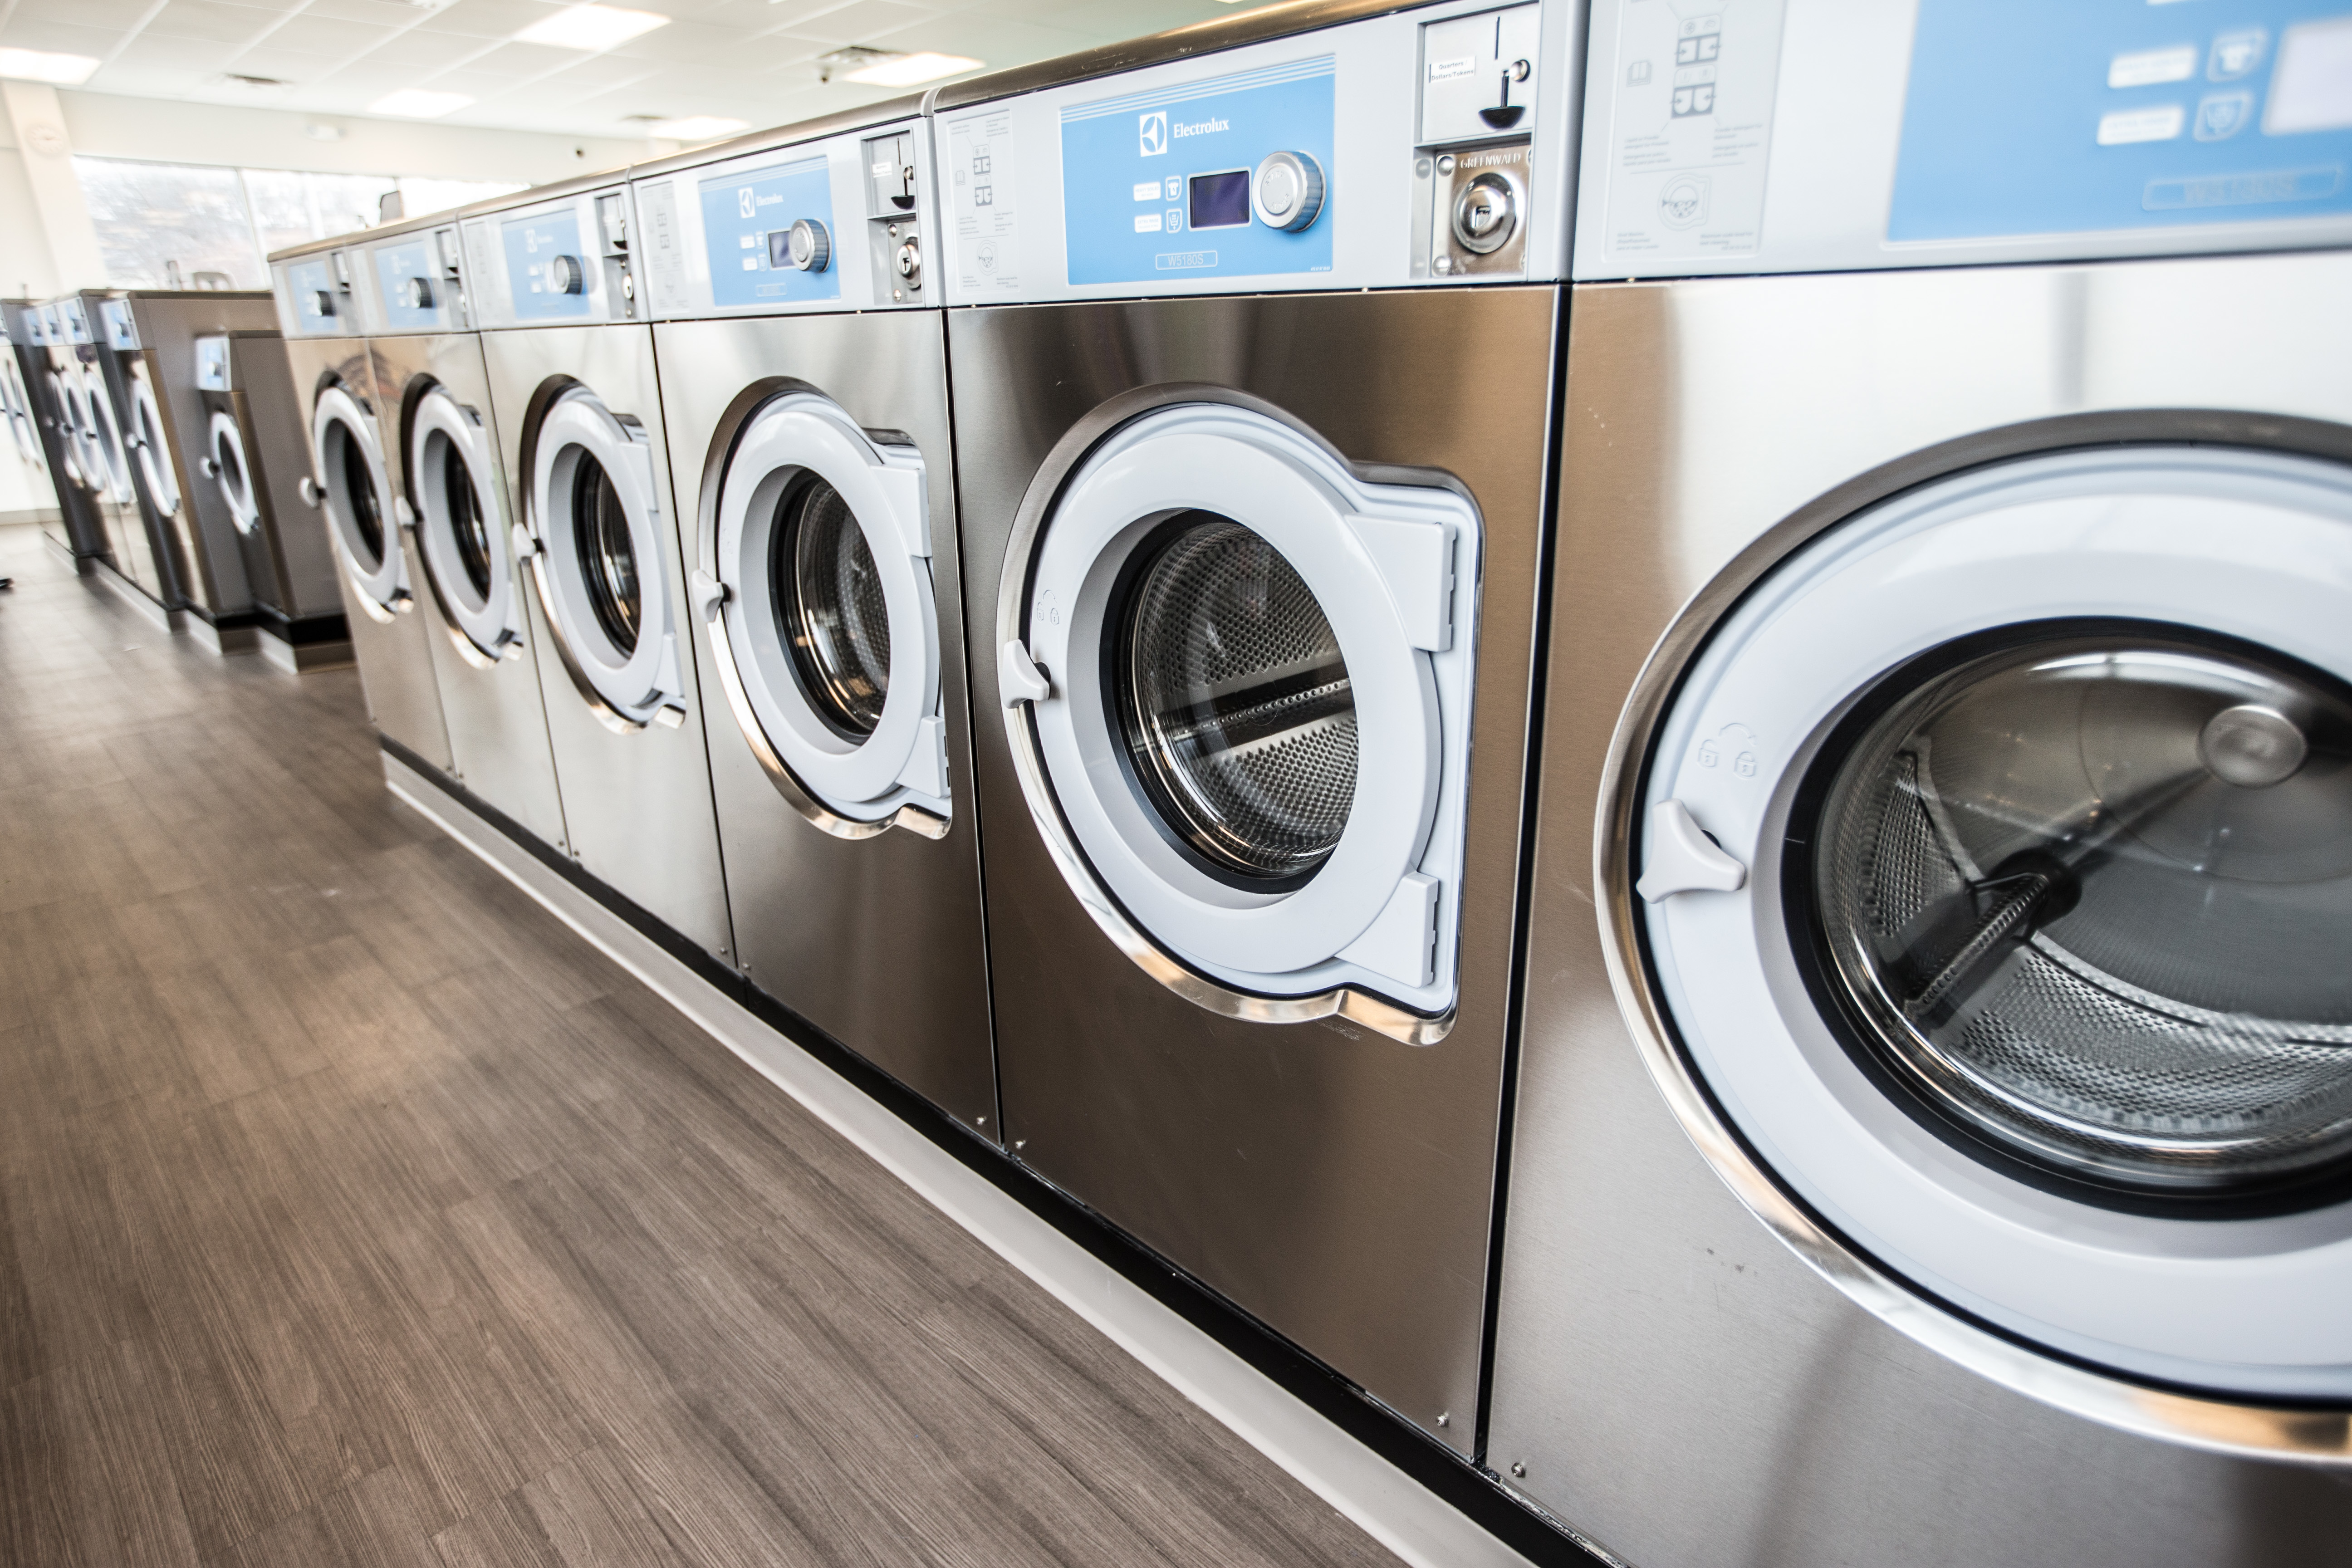 coin laundry shop near me